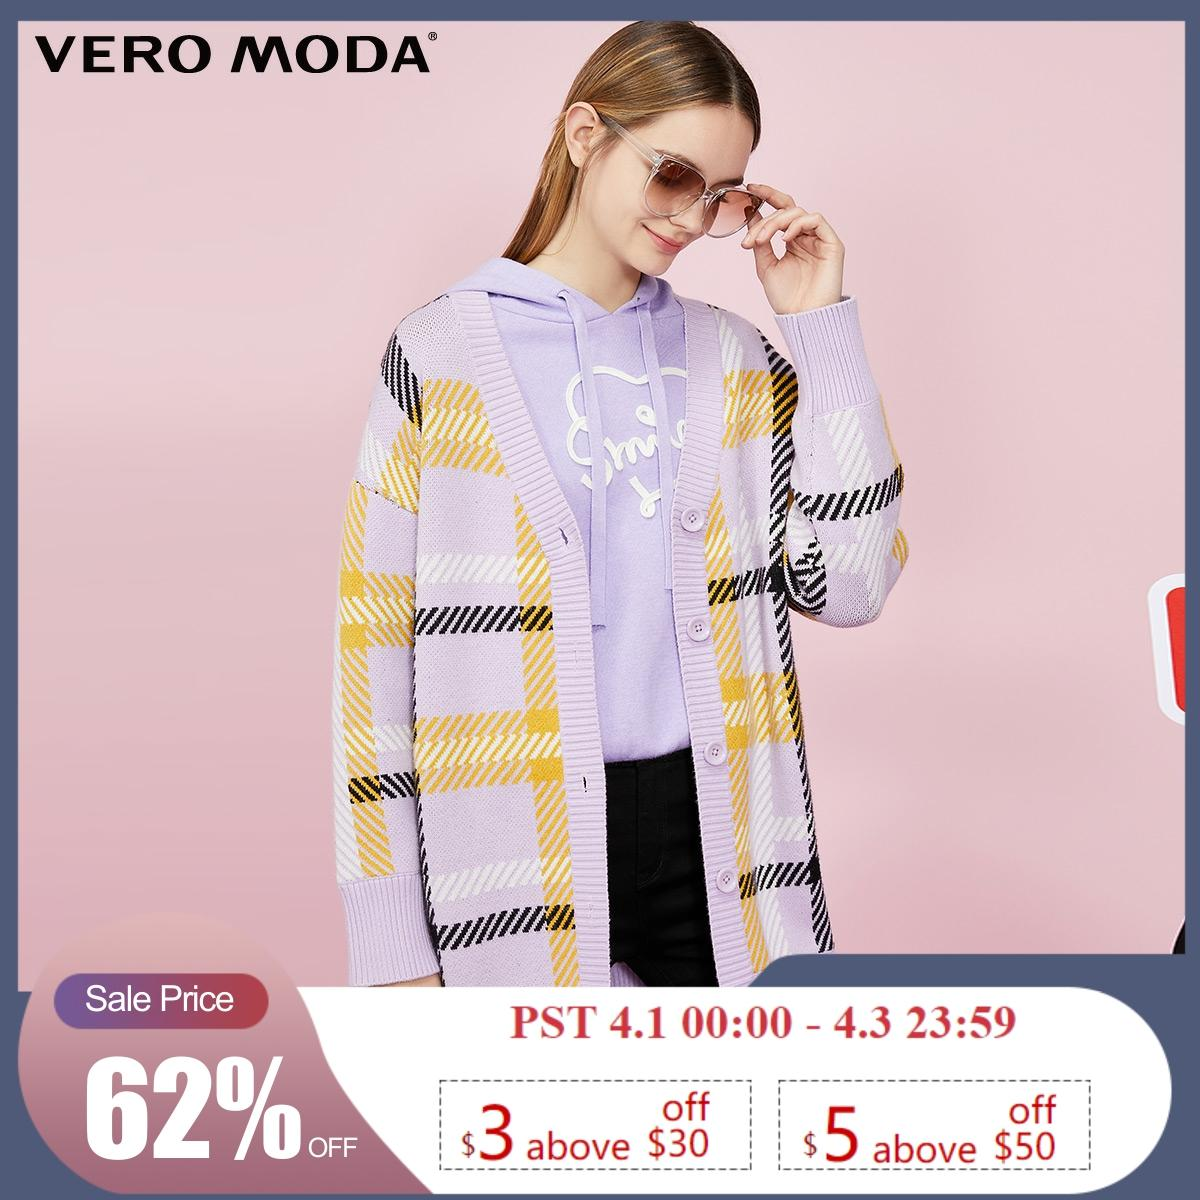 Vero Moda New Mid-length Plaid V-neck Single Breasted Off Shoulder Knit Cardigan | 319325501